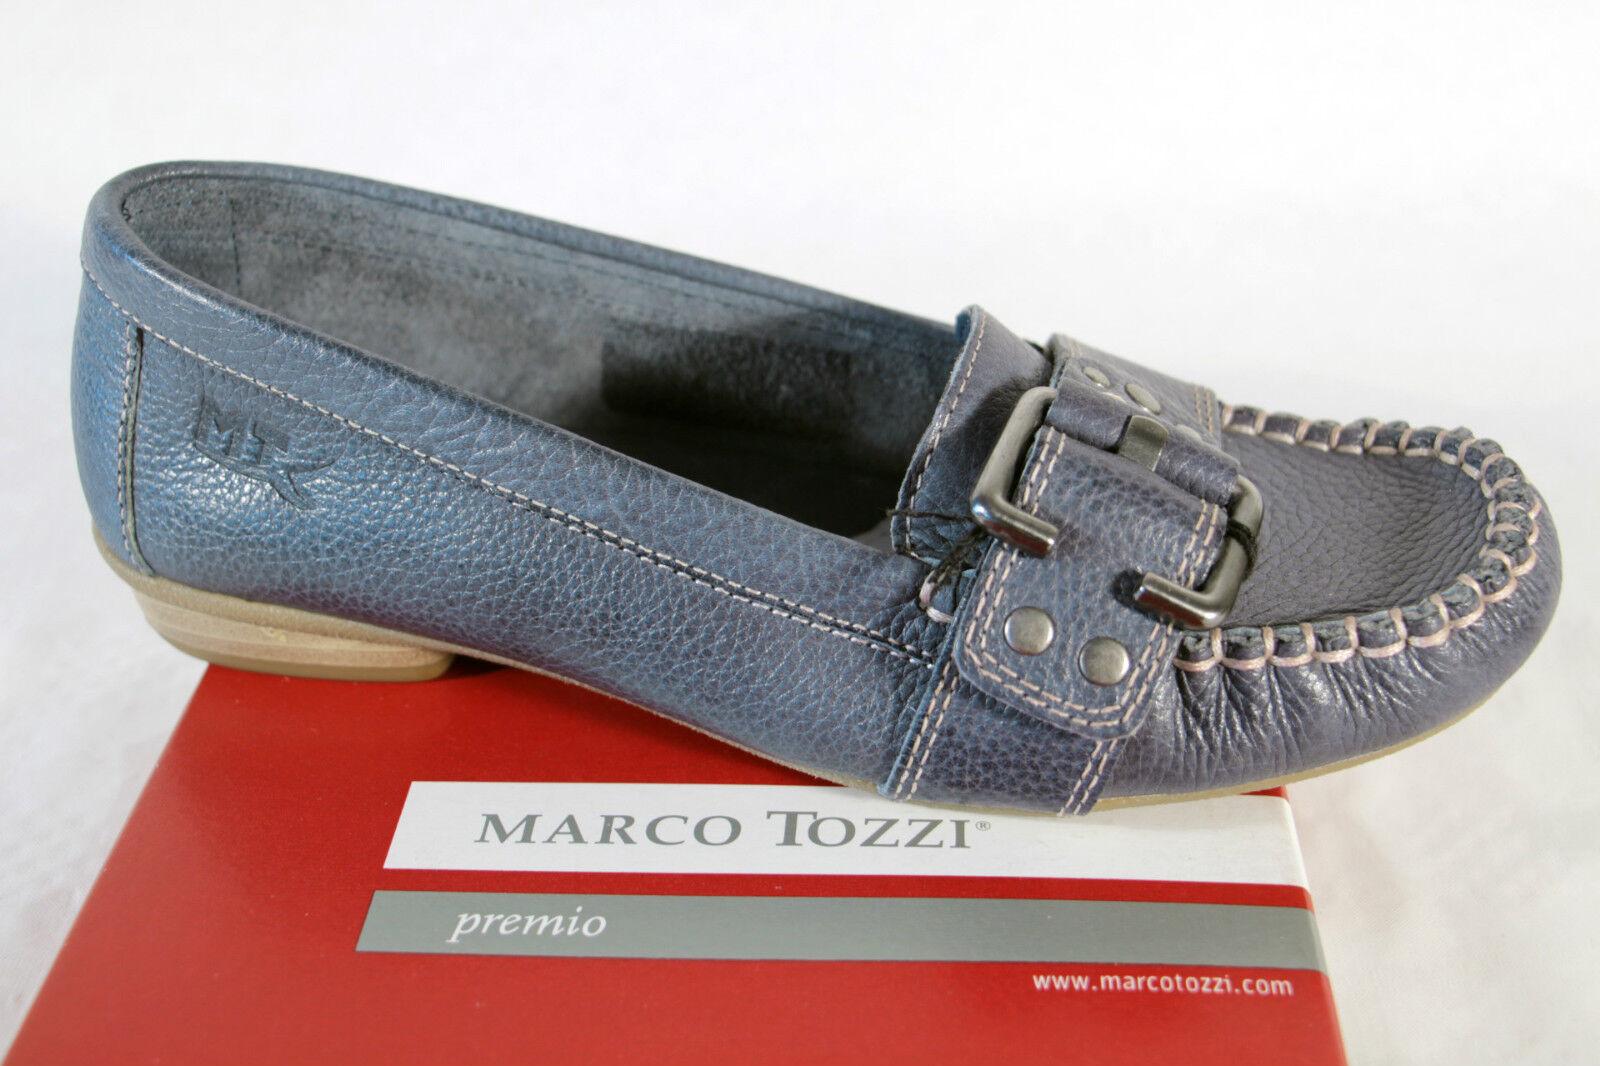 Marco Tozzi Damen Slipper Lederinnensohle Ballerina, blau Leder,  weiche Lederinnensohle Slipper NEU db0b54